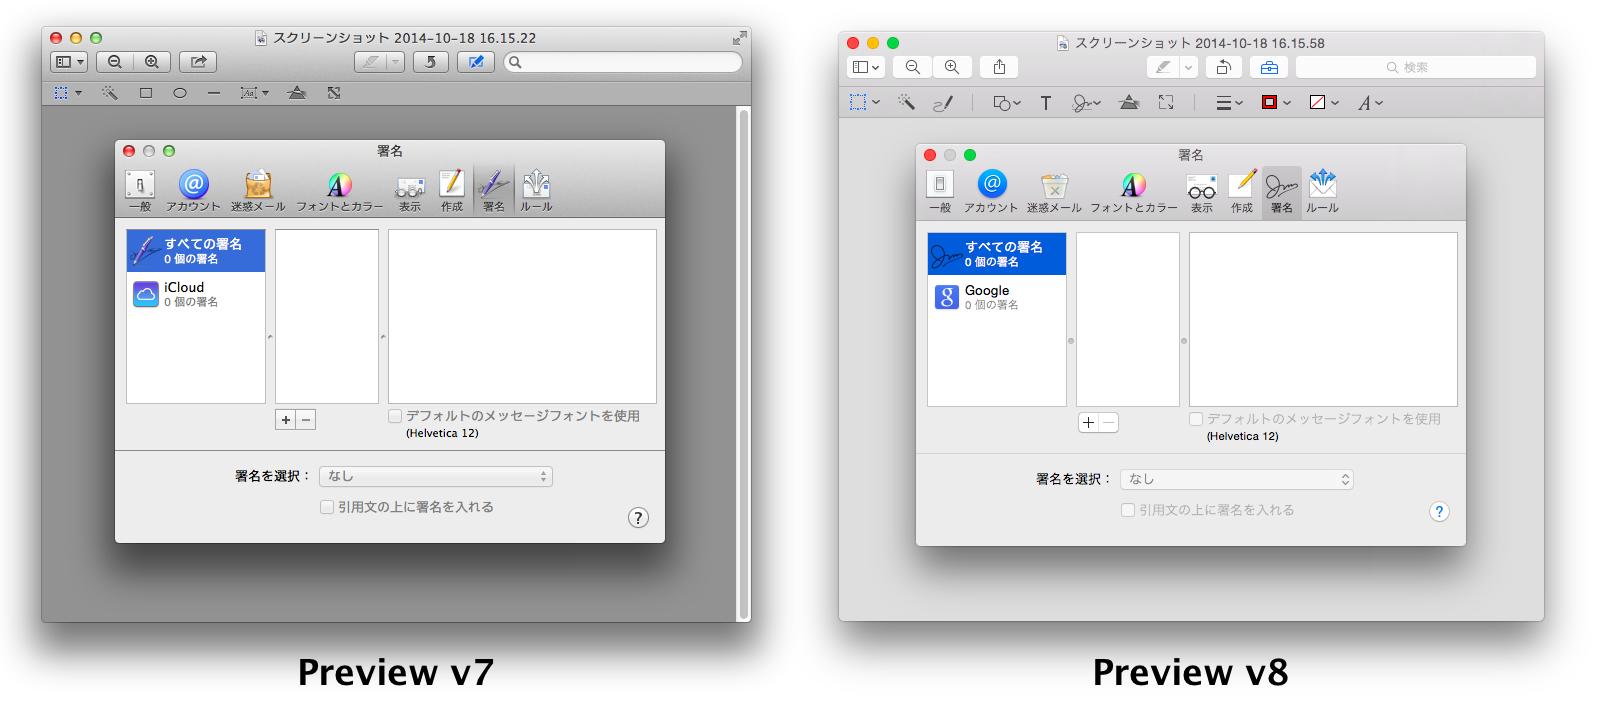 iOS7葬式会場 Part7【 iOS8,Yosemite,フラットデザイン 】YouTube動画>1本 ->画像>77枚